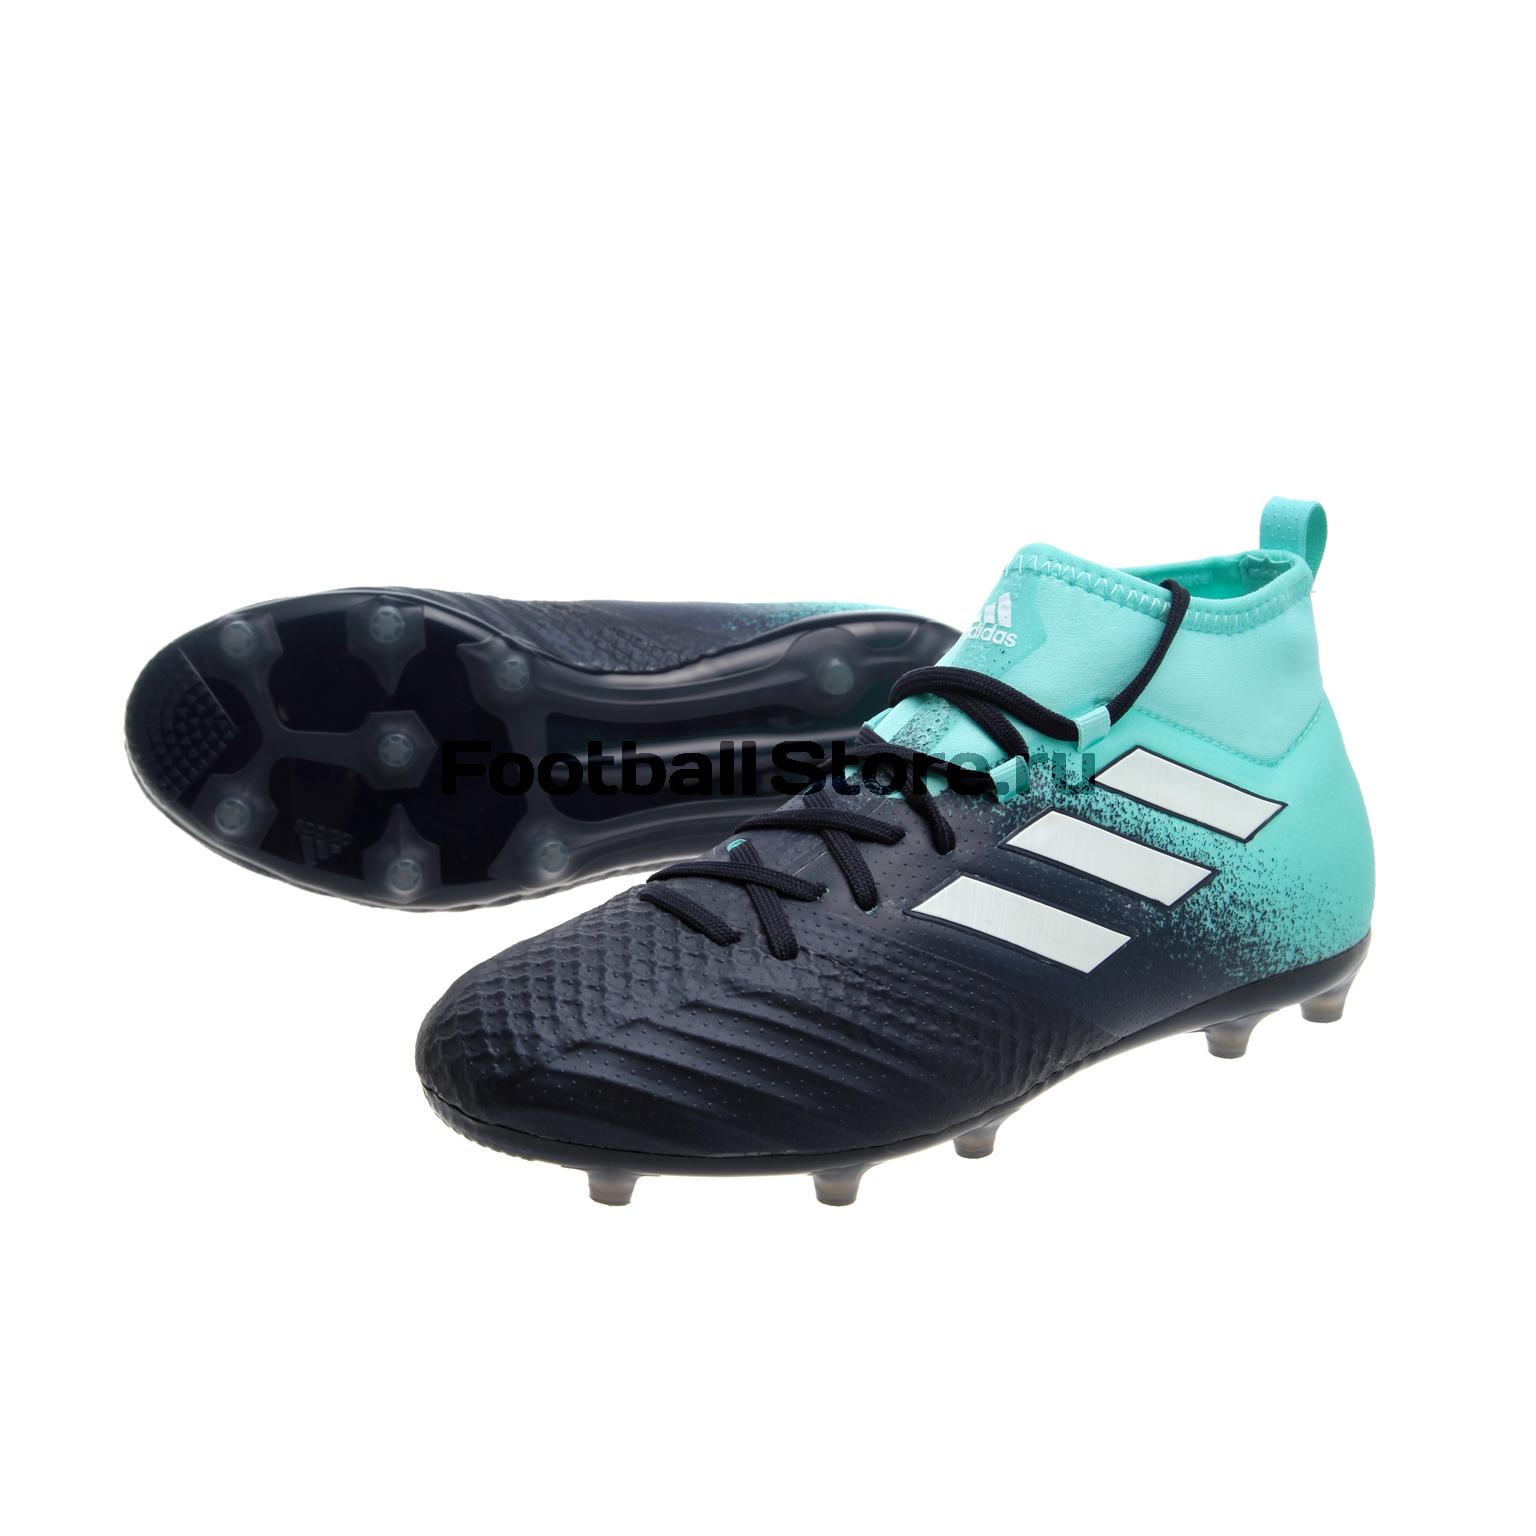 Бутсы детские Adidas Ace 17.1 FG S77040